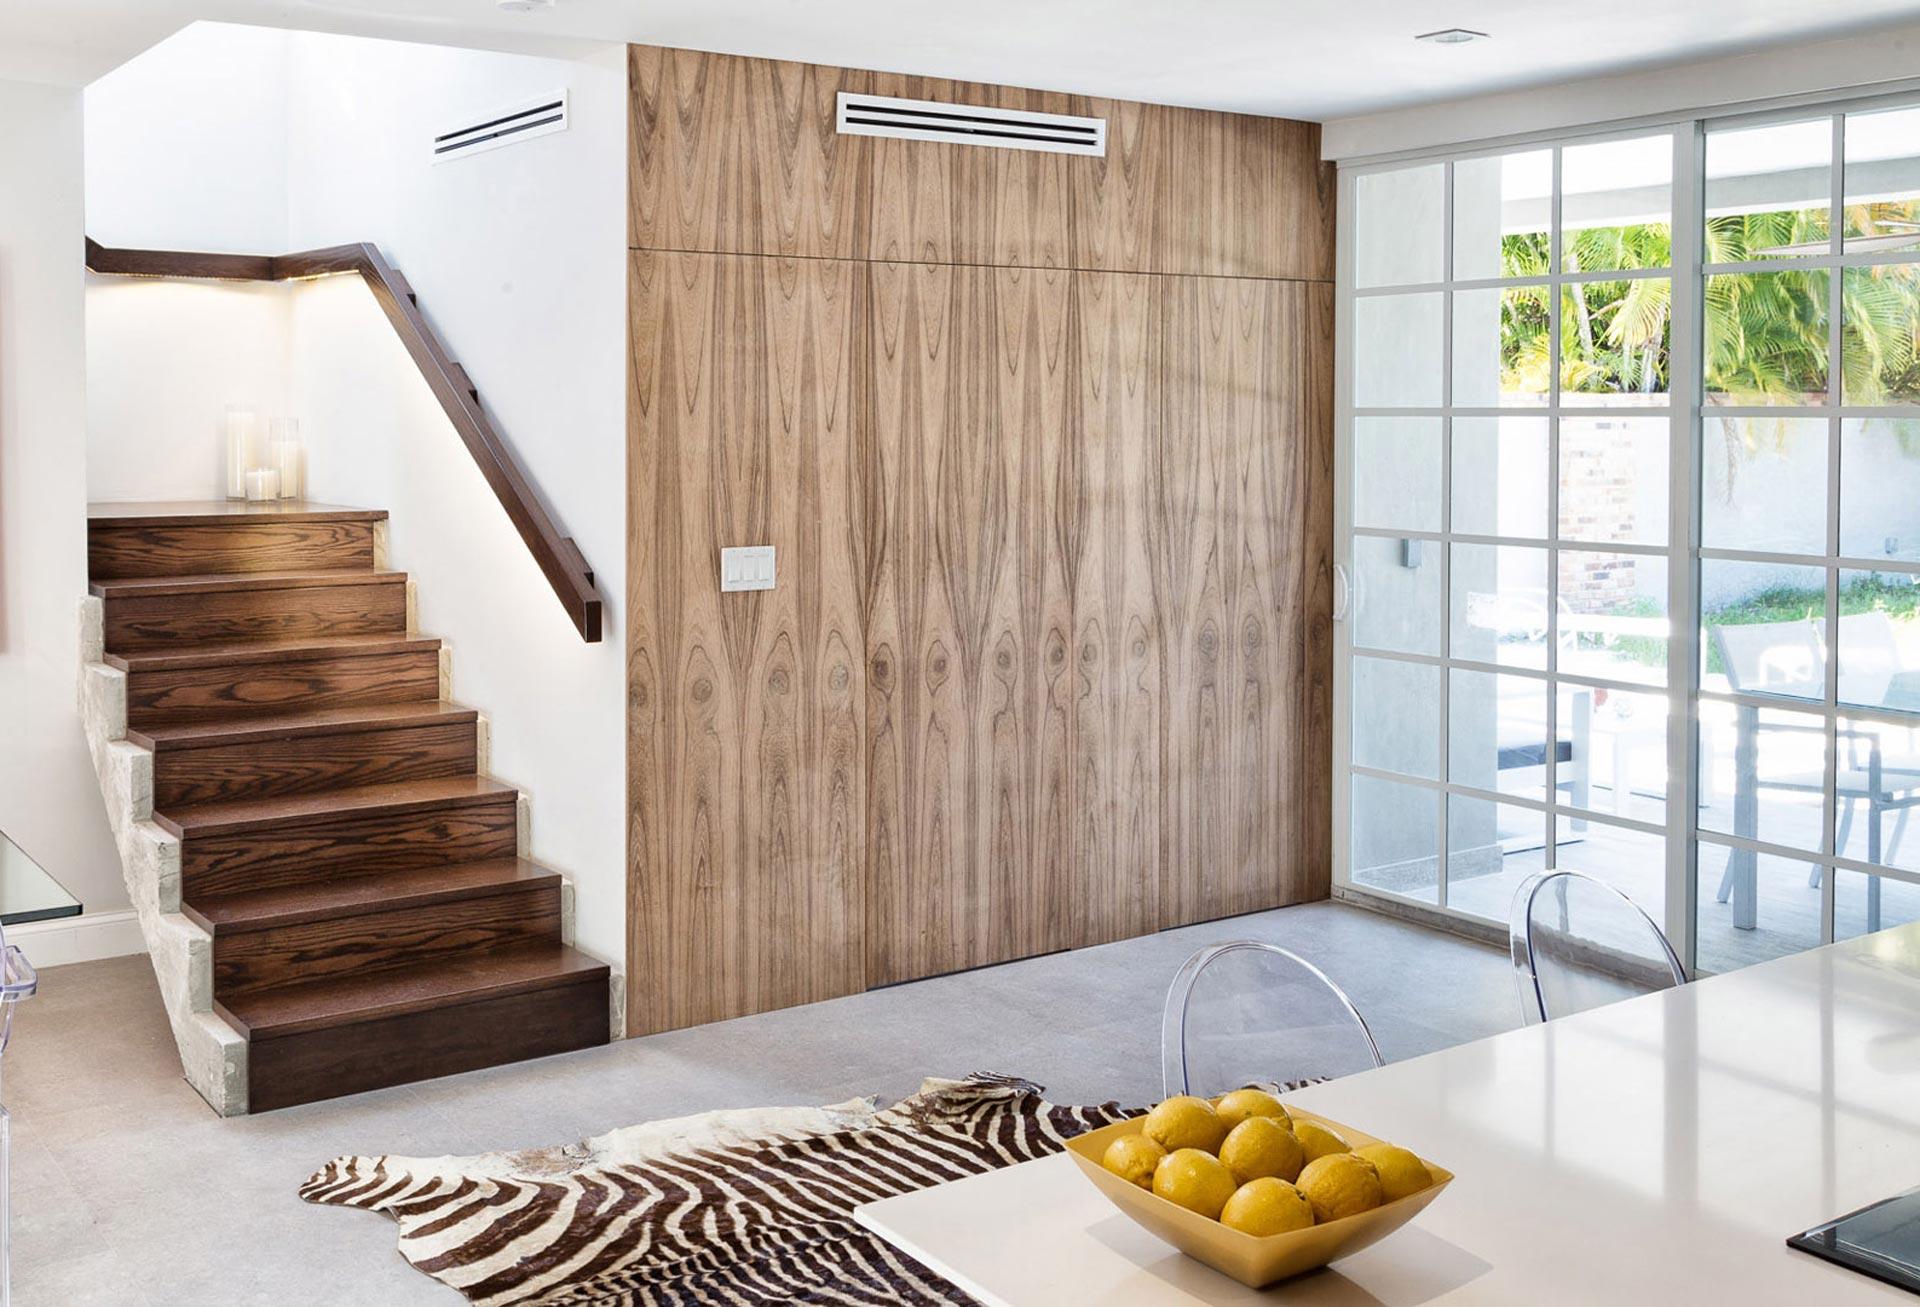 Key-Biscayne-Residence10_fundo-home